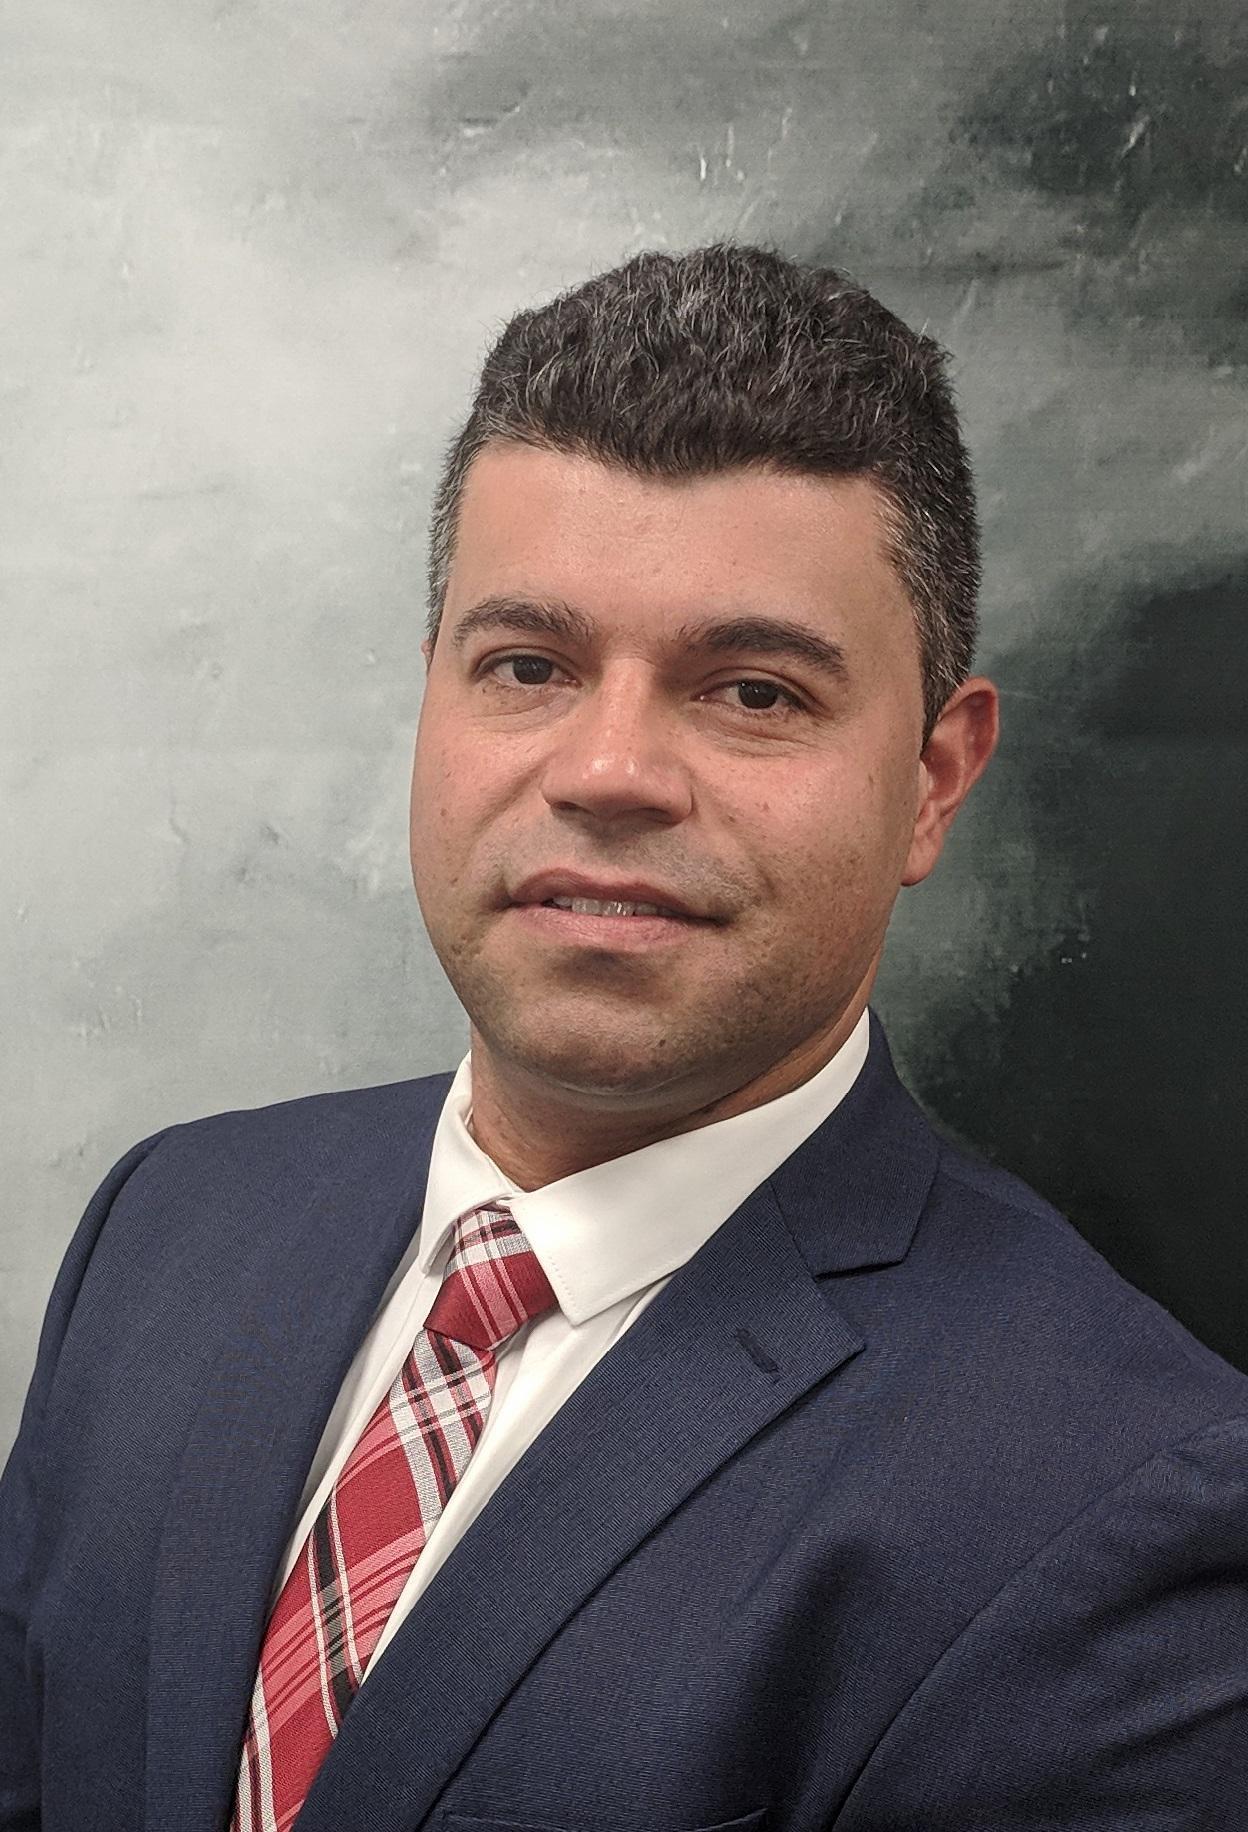 LUIS FERNANDO AGUIRRE Financial Professional & Insurance Agent